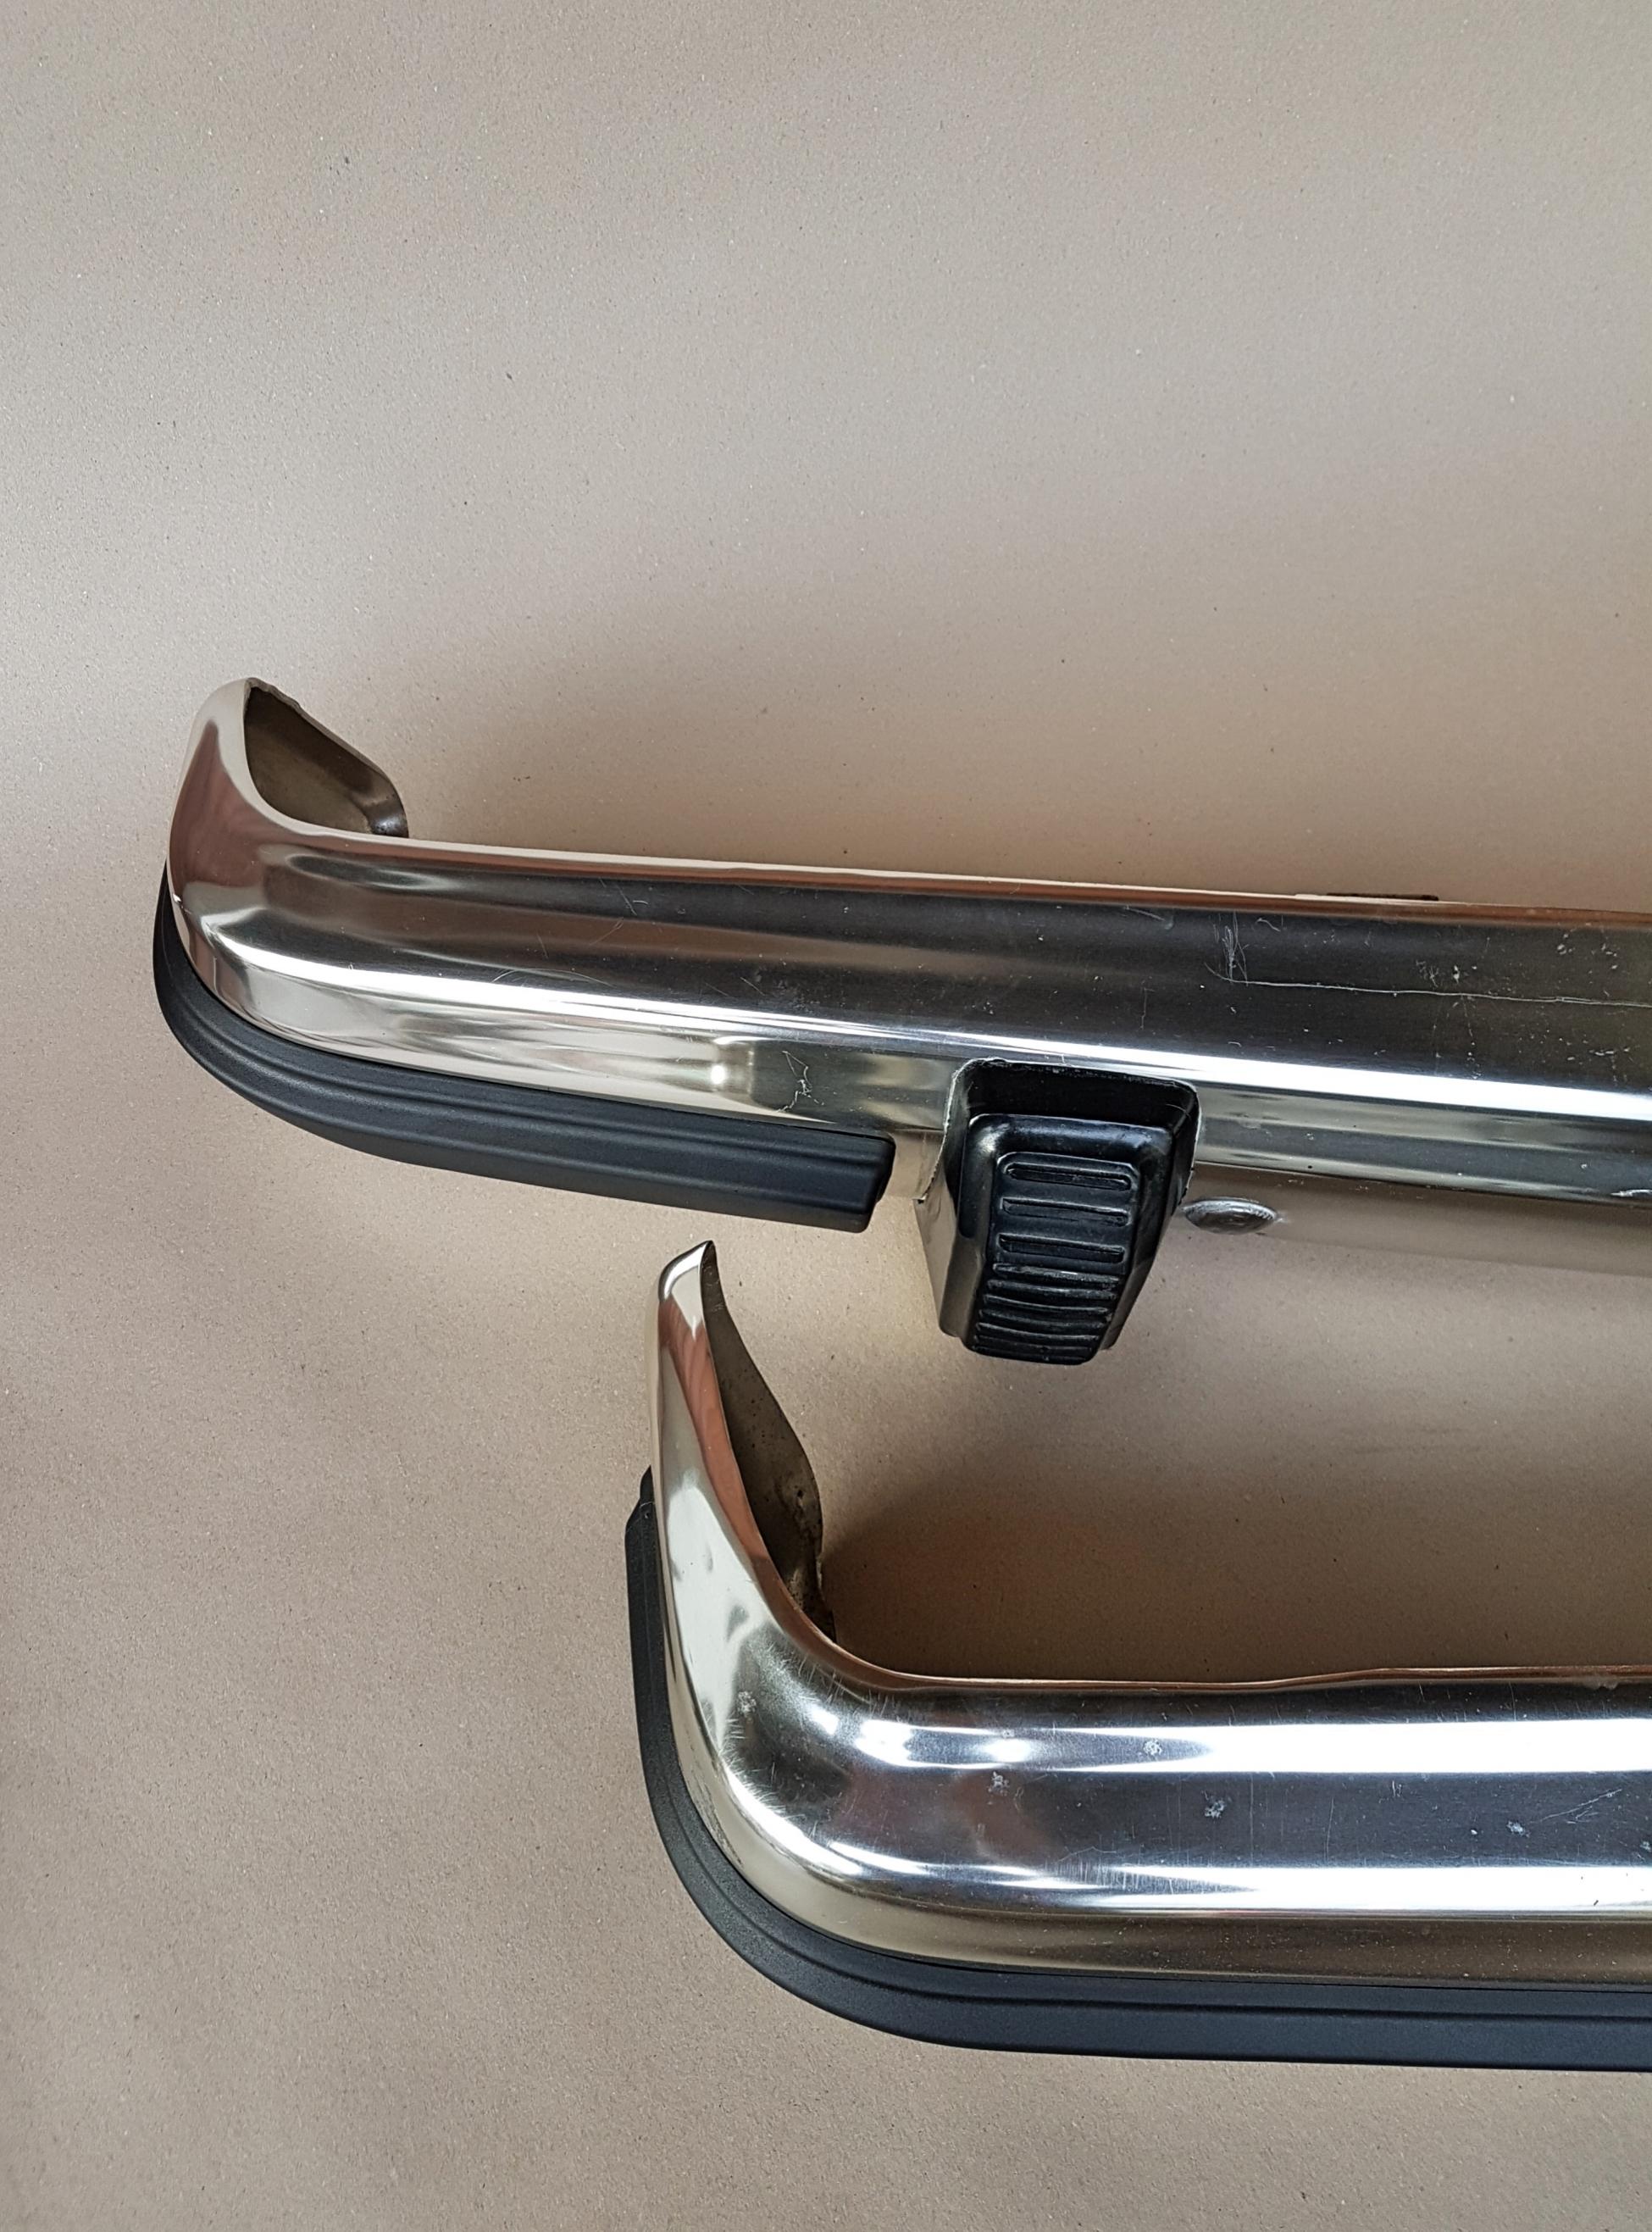 jeep-grand-wagoneer-bumper-stripes-reproduction-29.jpg